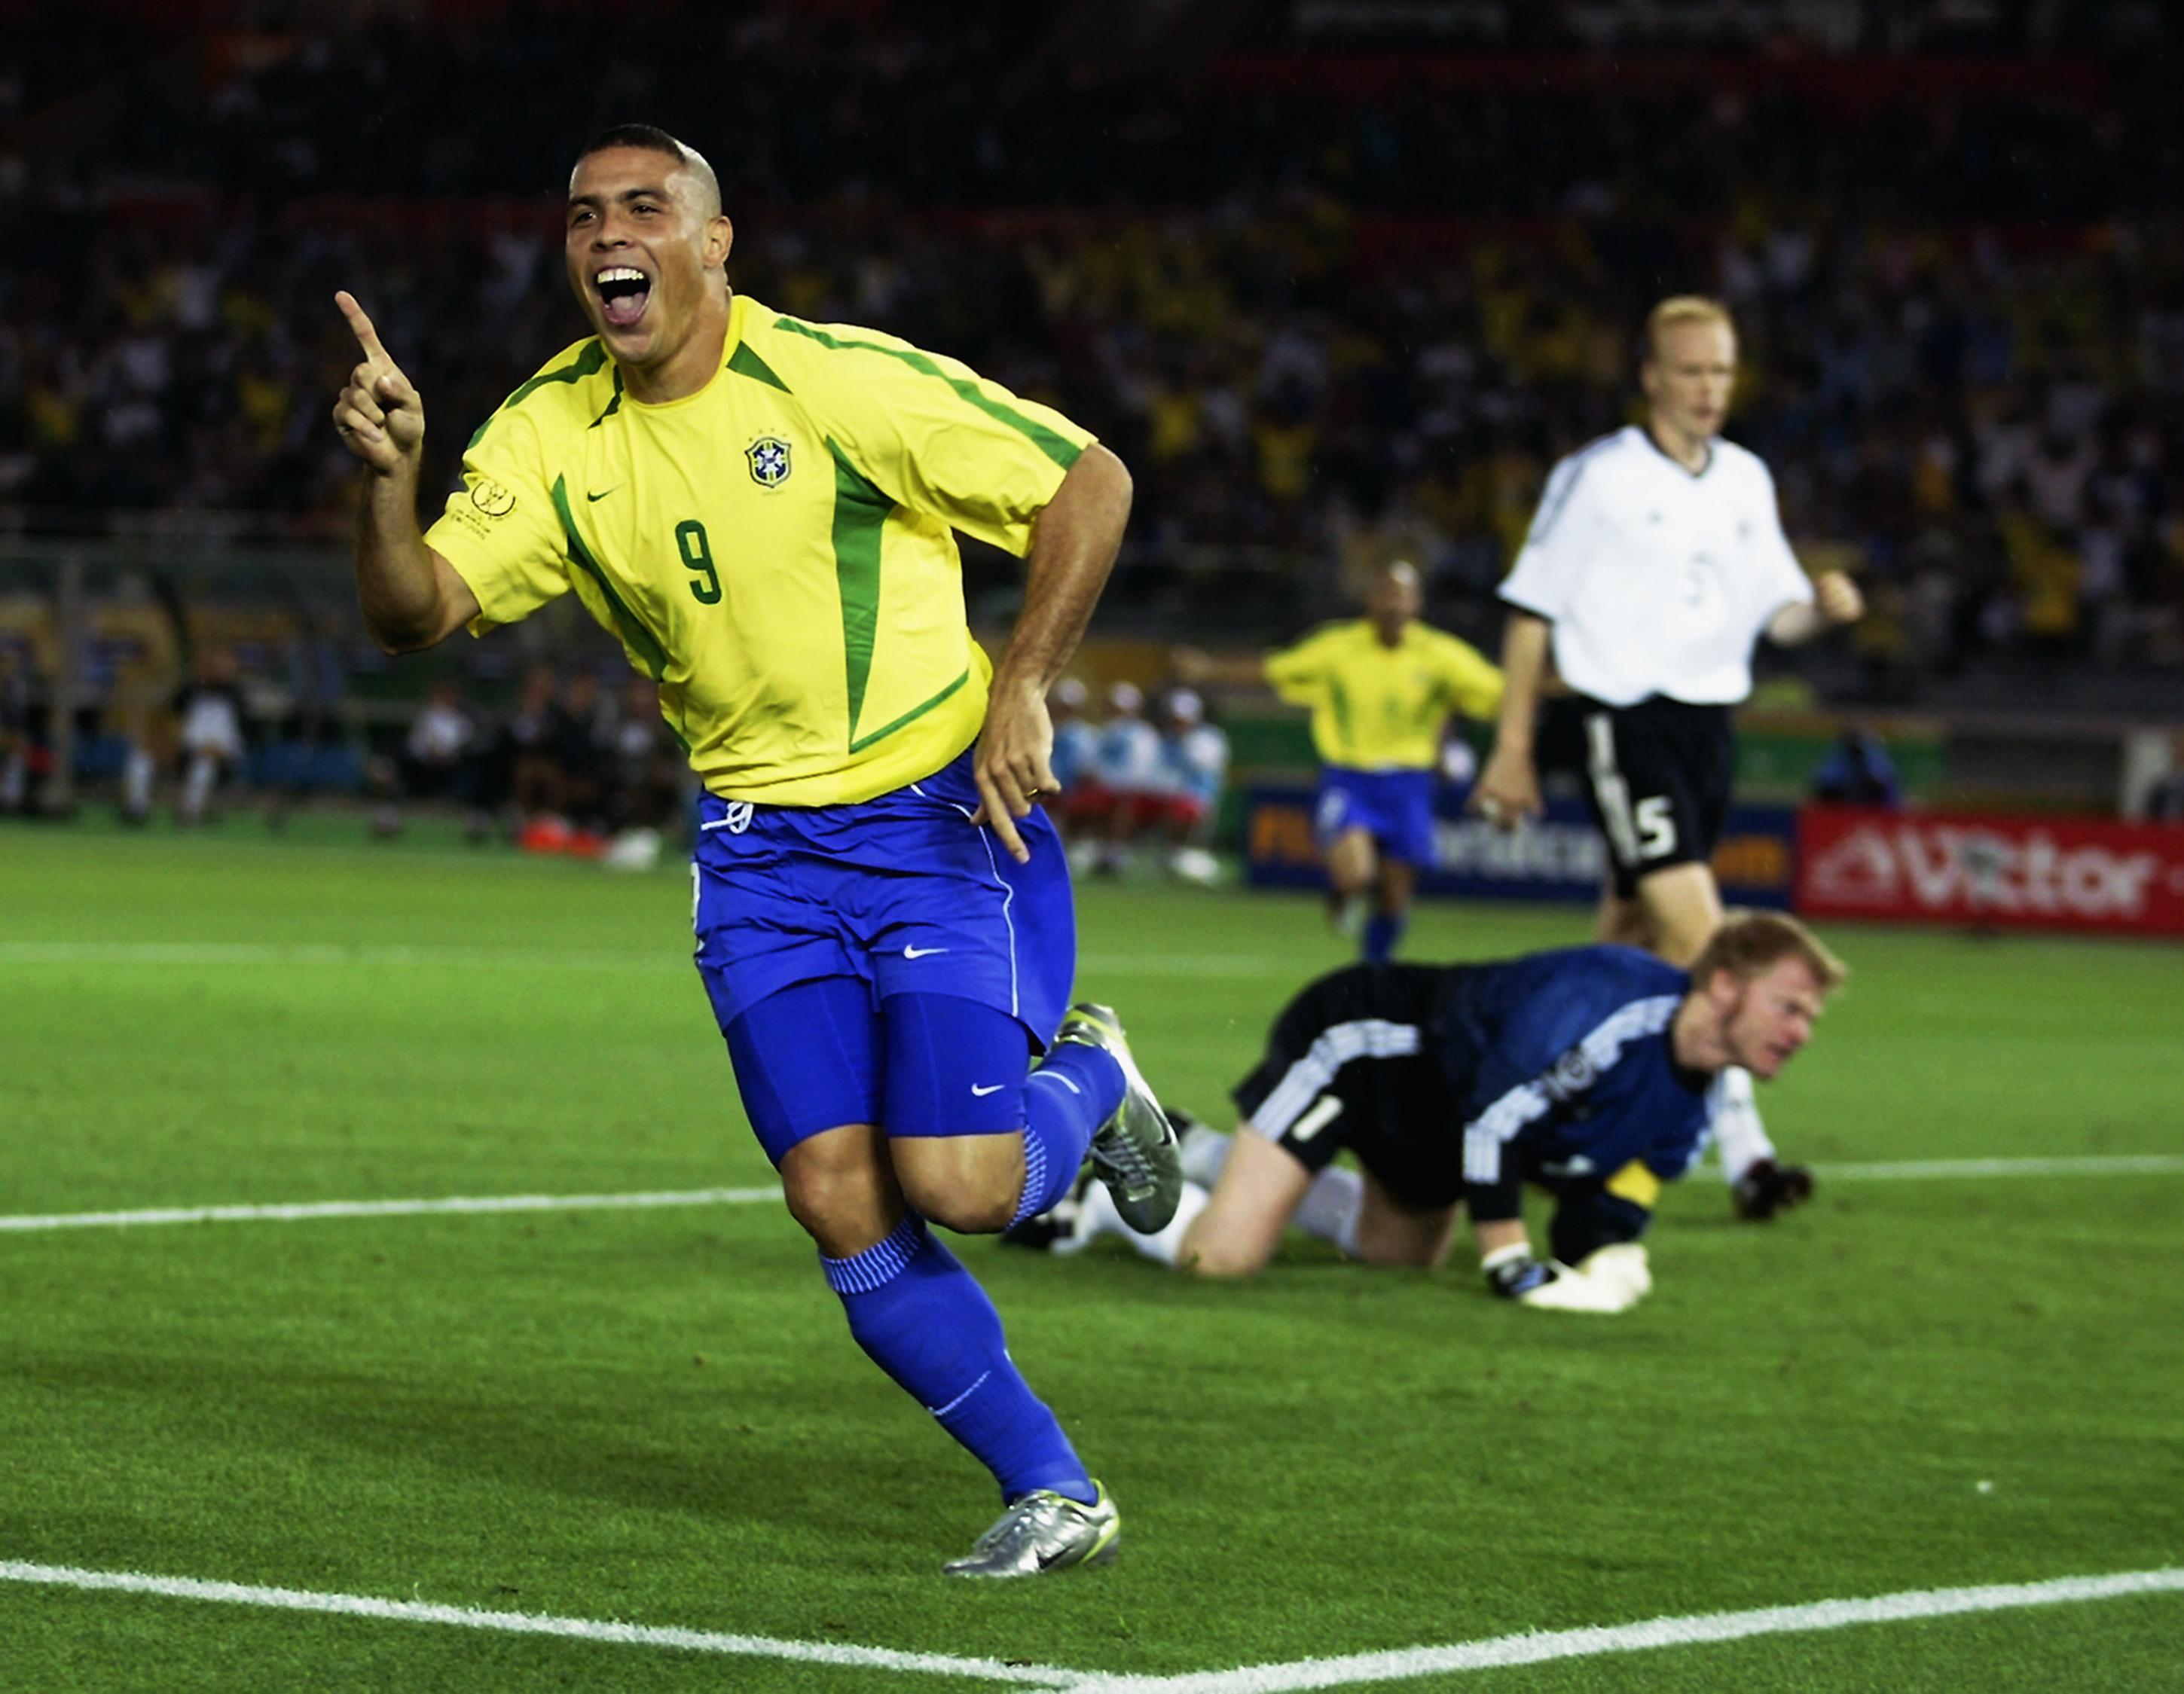 67611dba7e3 YOKOHAMA - JUNE 30  Ronaldo of Brazil celebrates after scoring opening goal  during the Germany